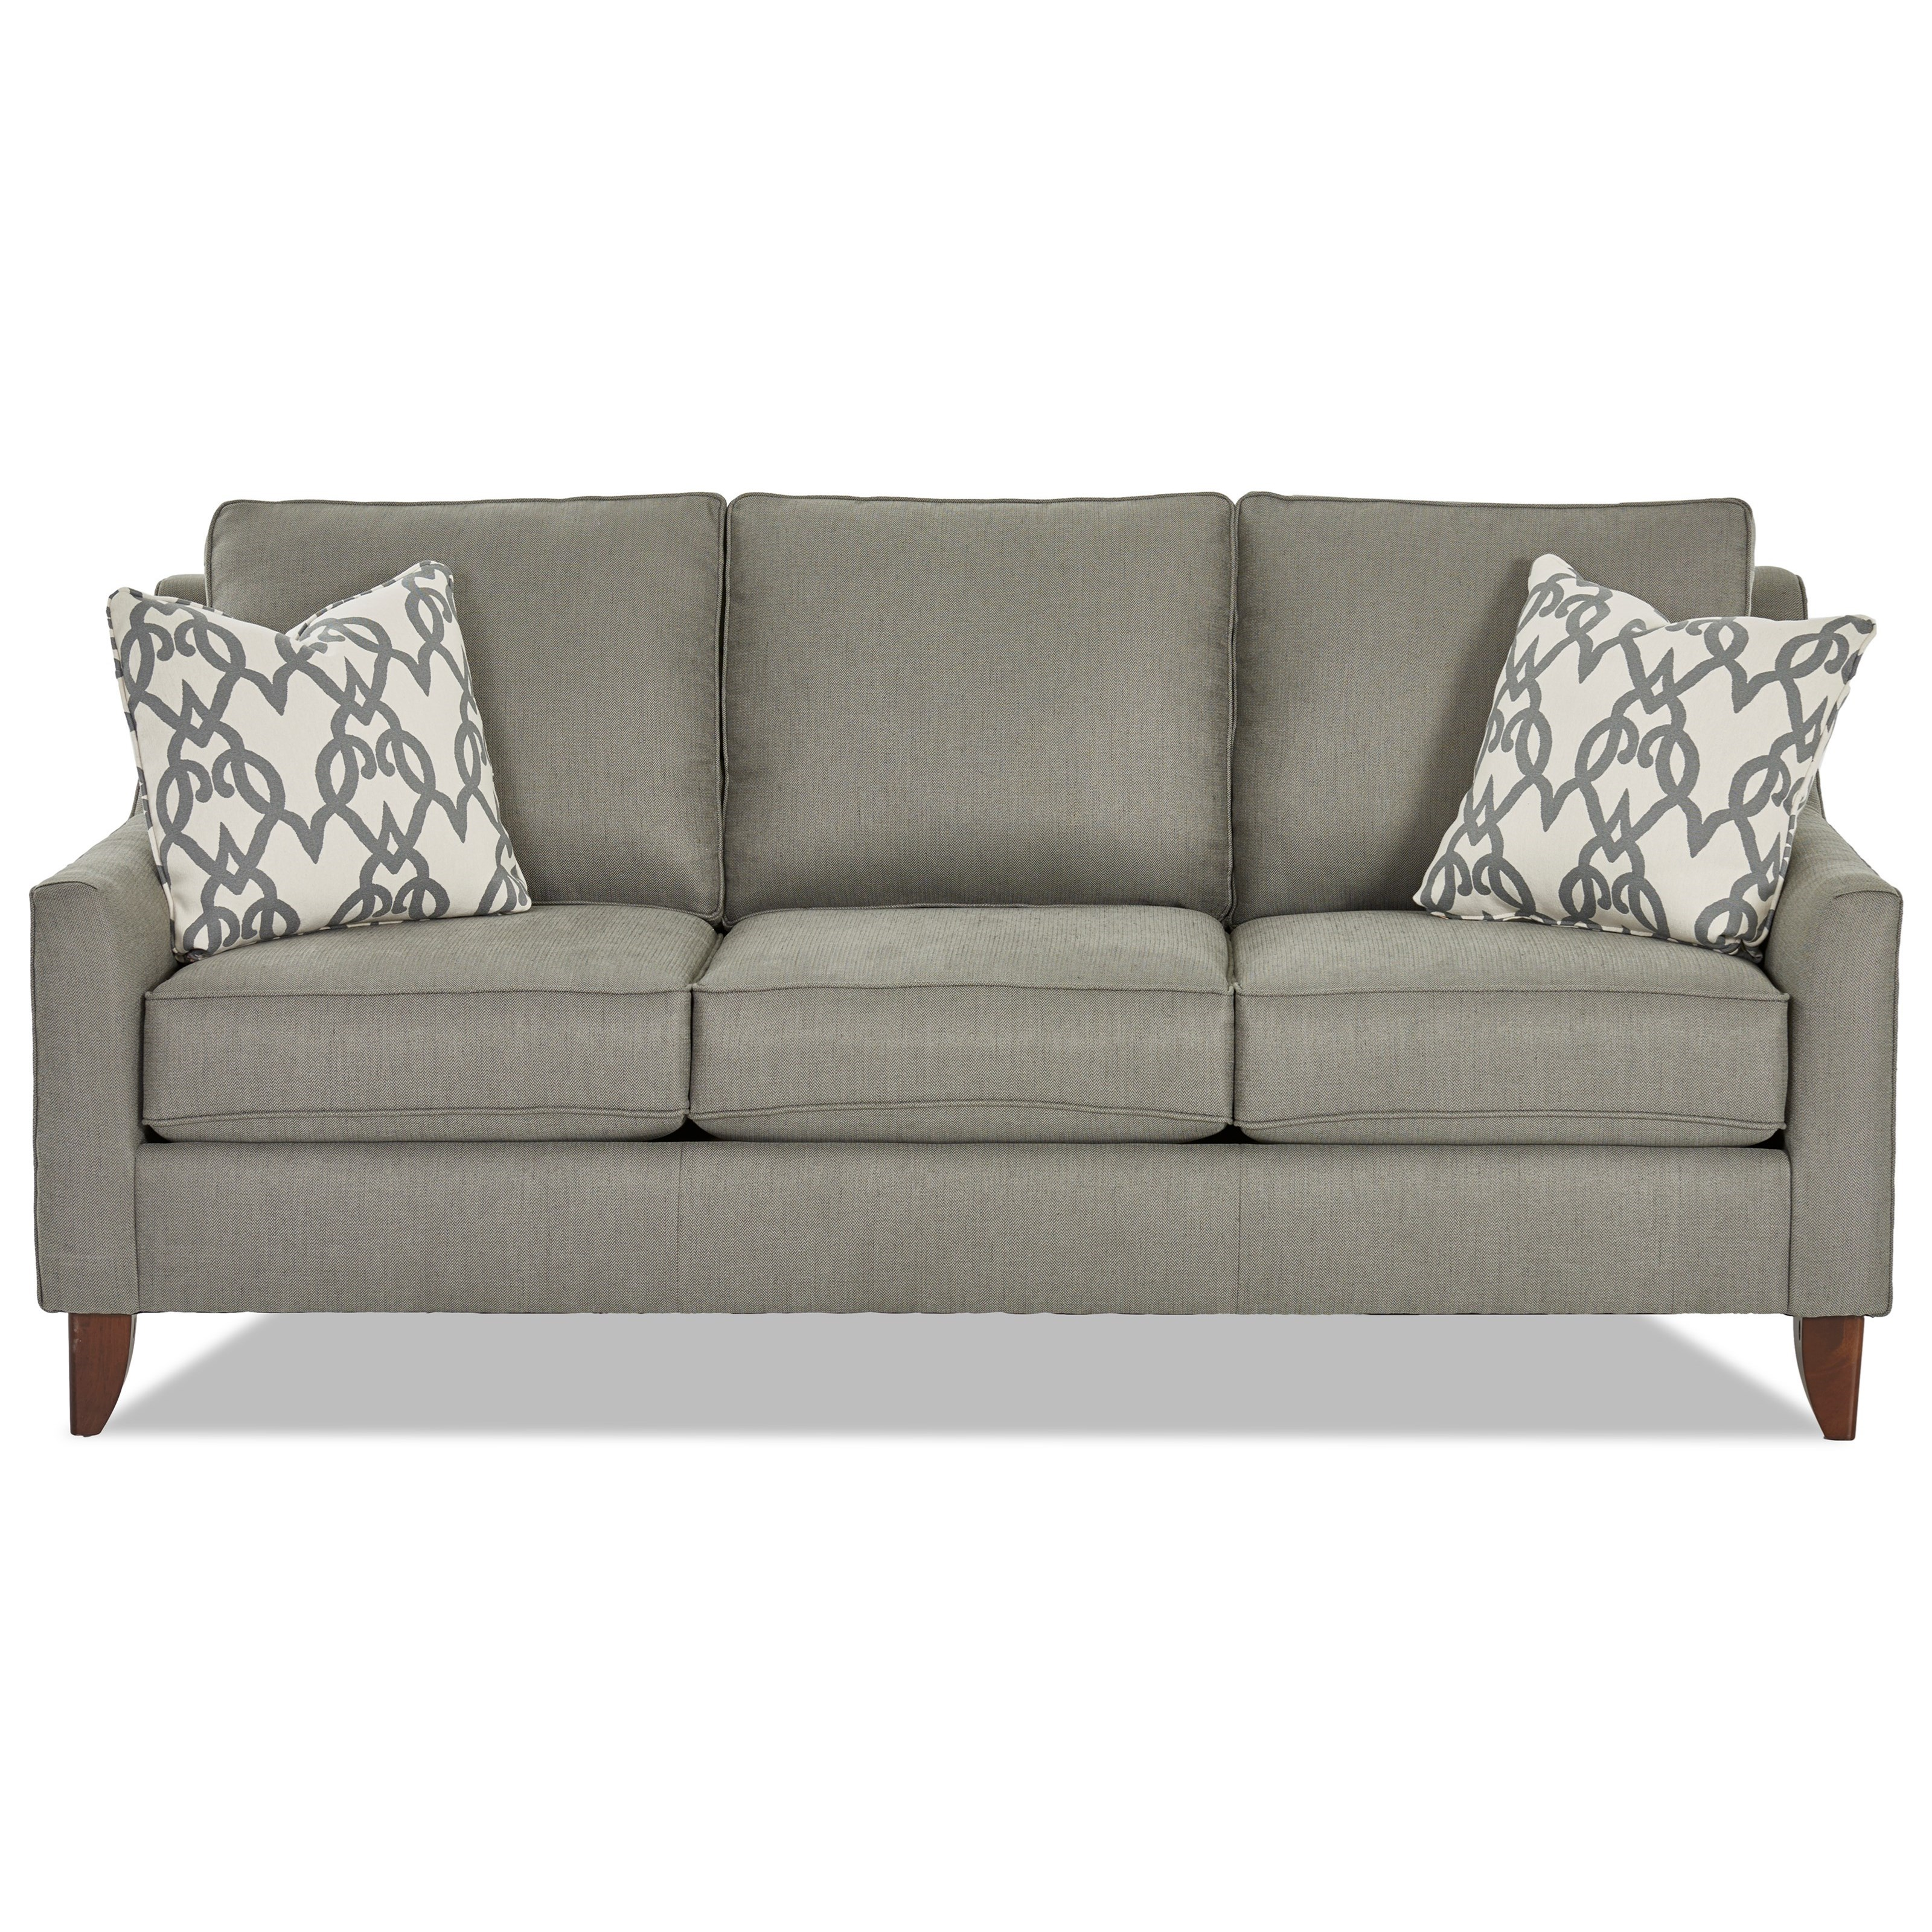 Klaussner Belton BELTON Sofa - Item Number: K10200 S